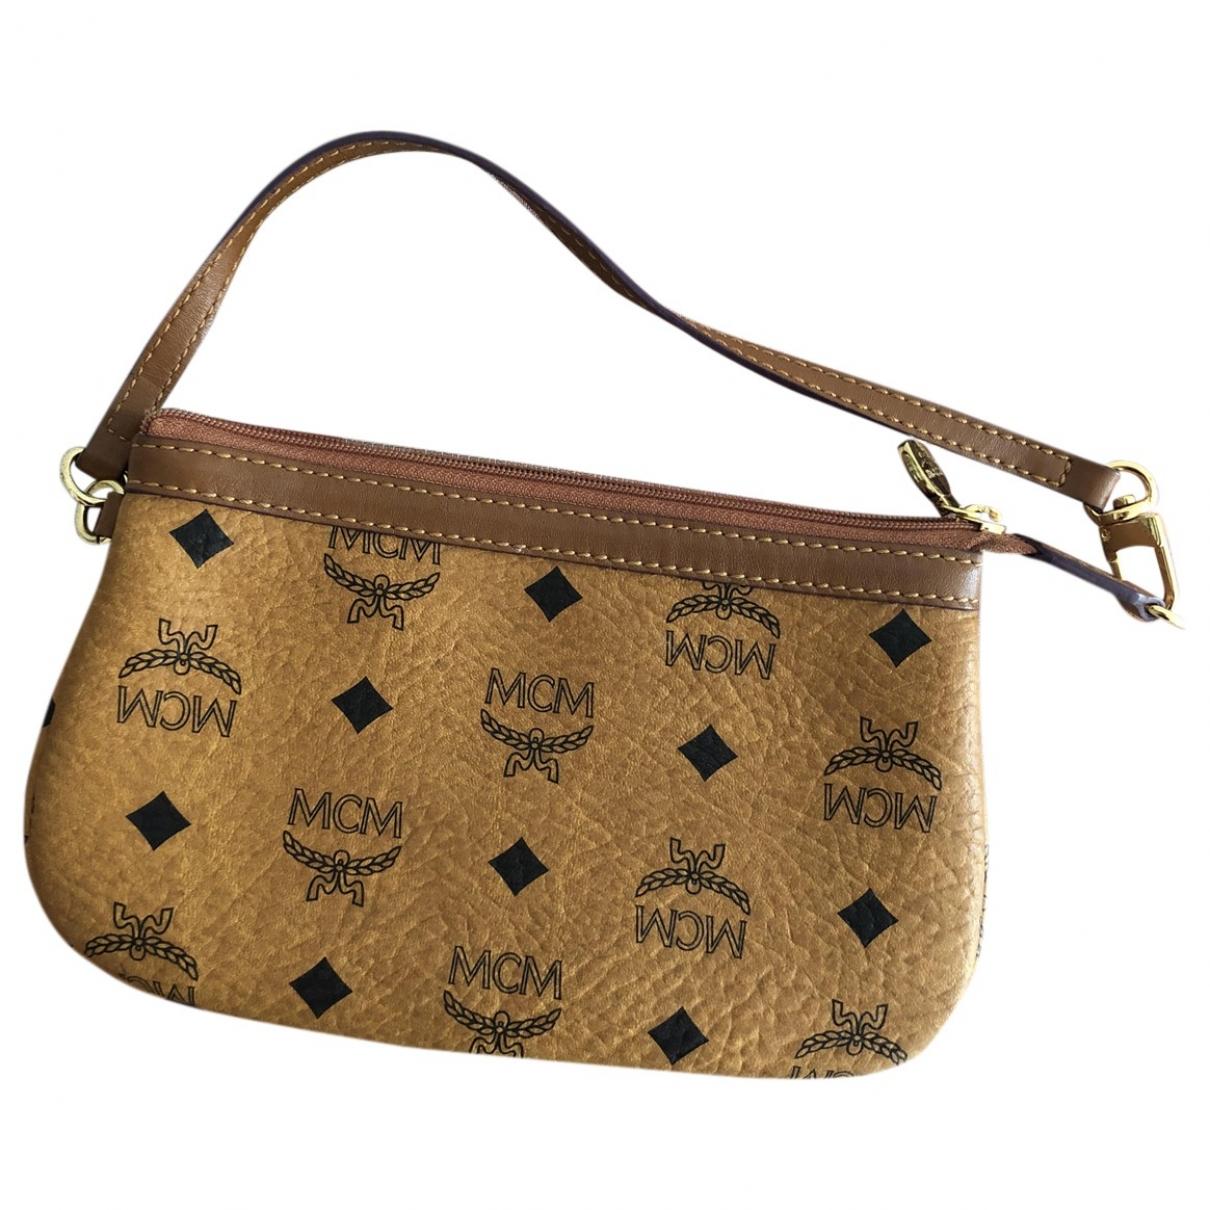 Mcm \N Brown Leather Clutch bag for Women \N